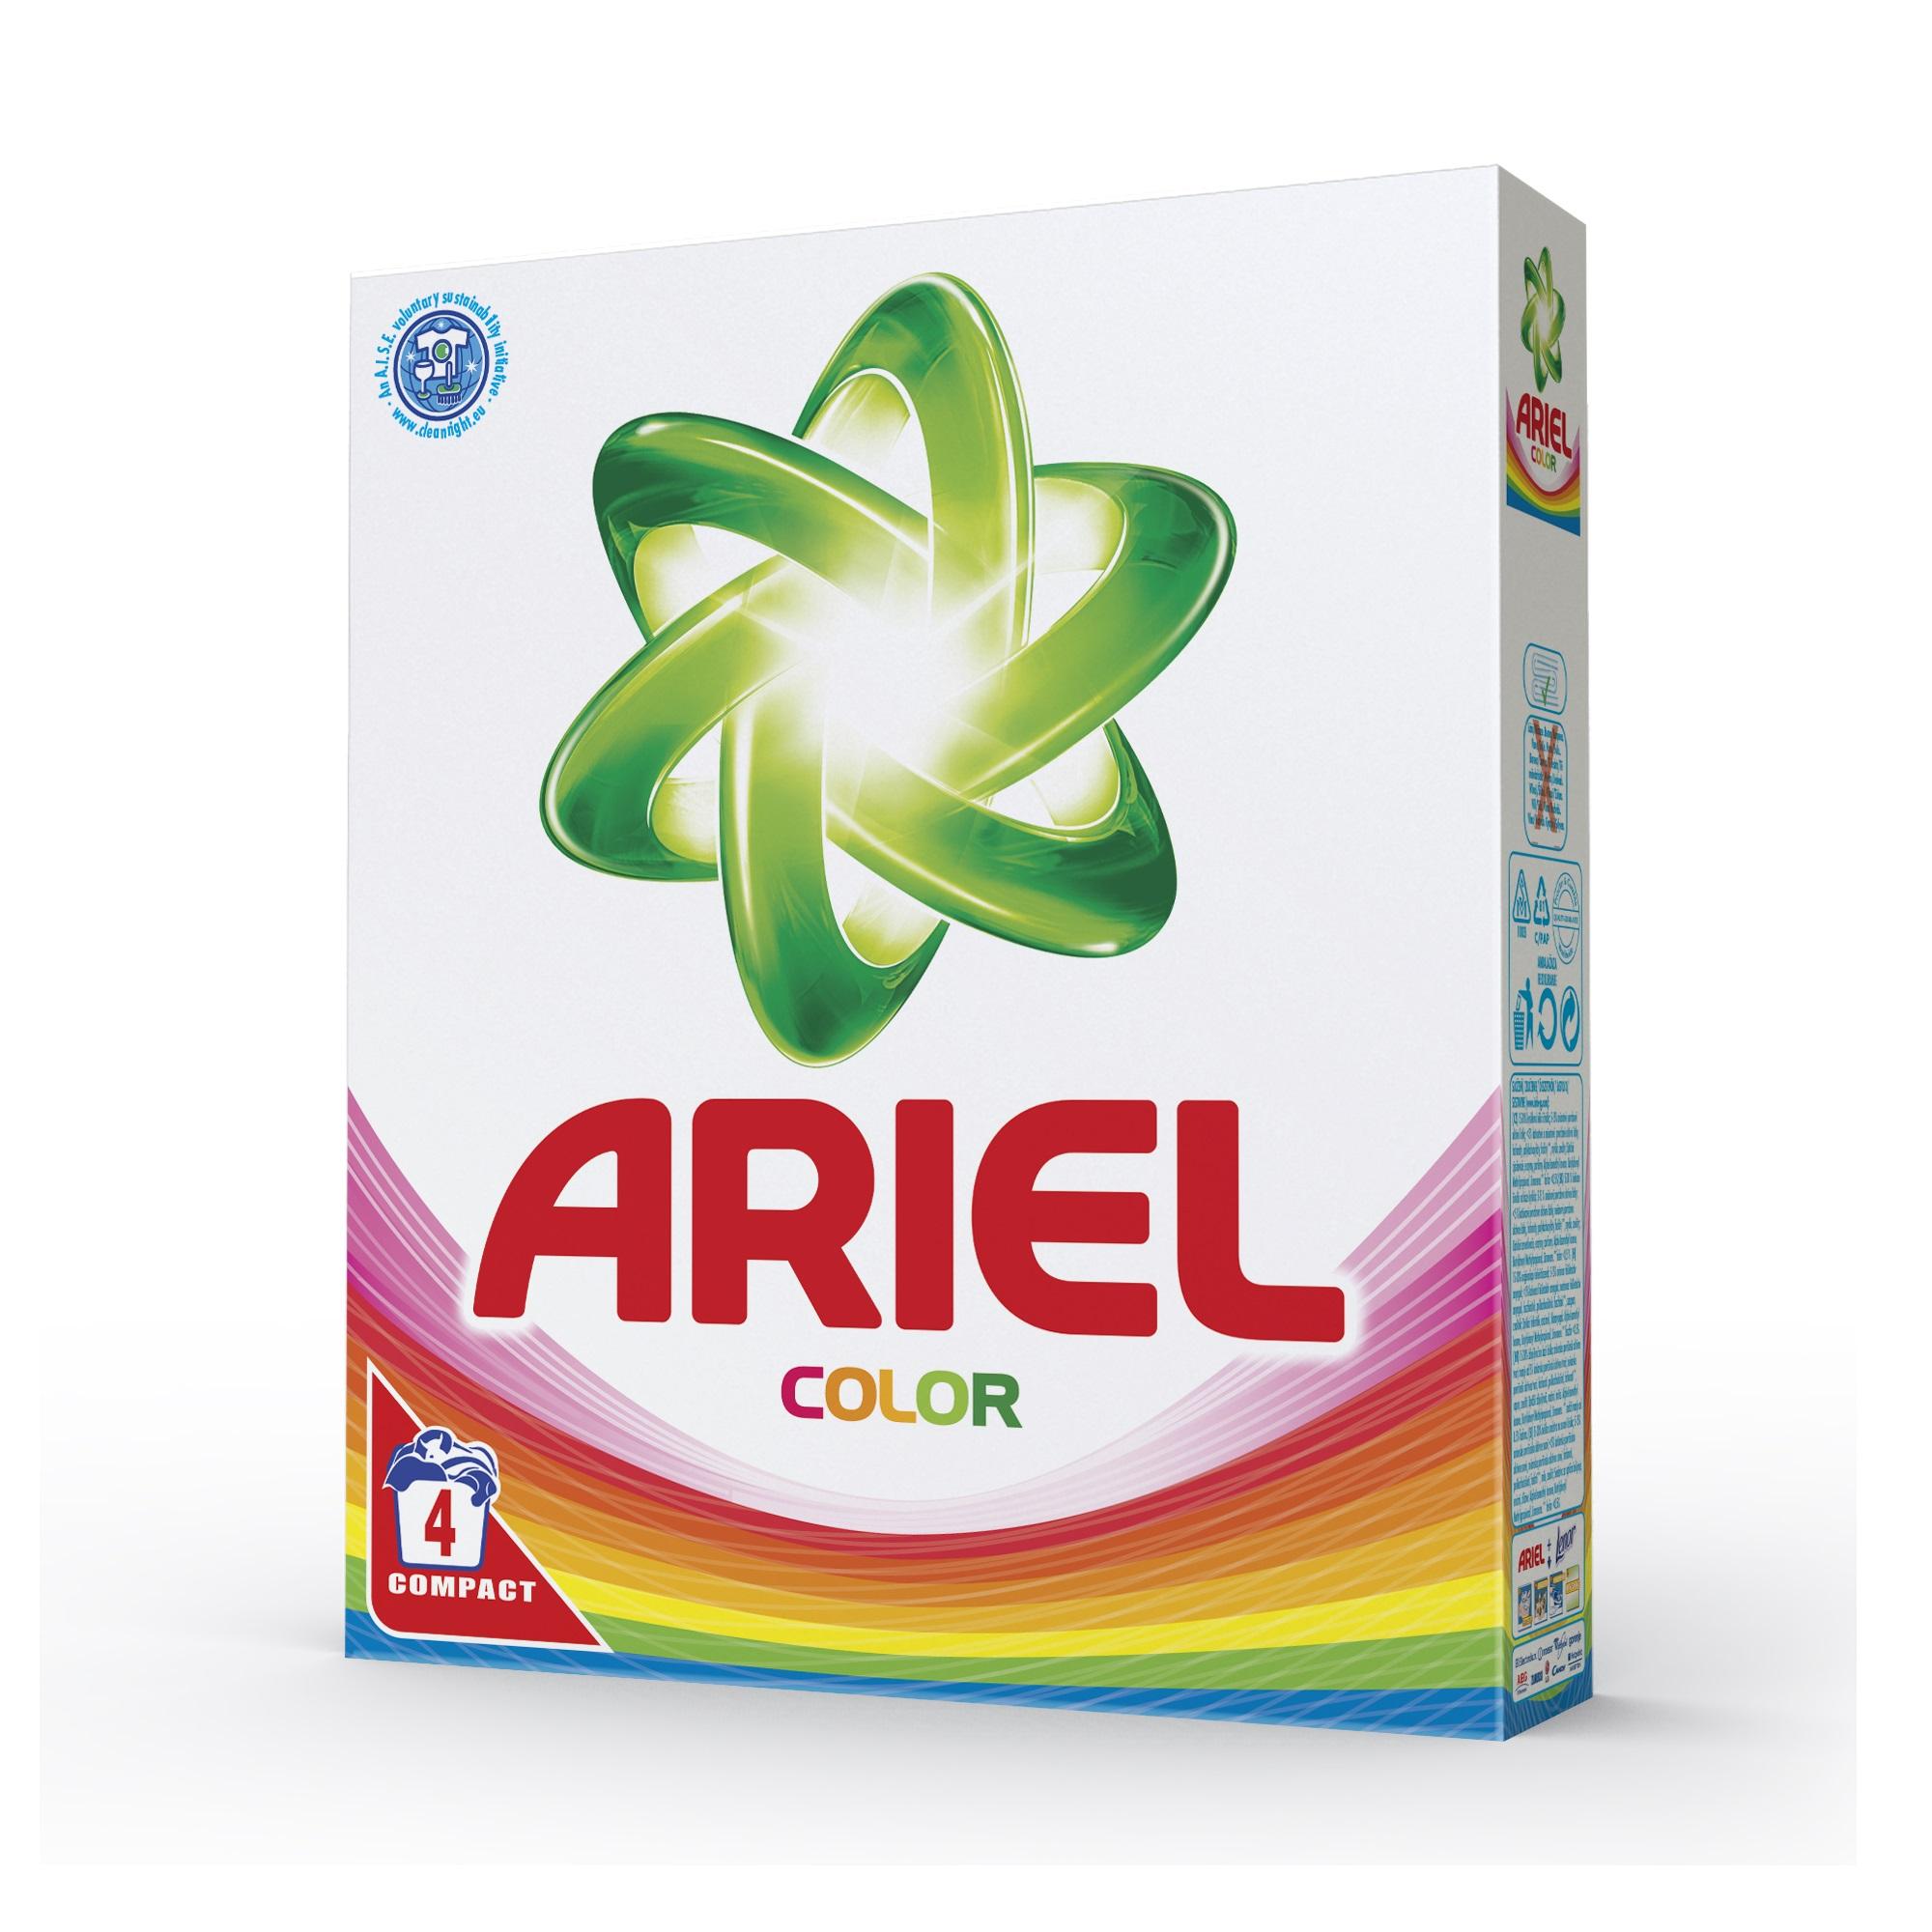 Ariel 280g 4dávky Color